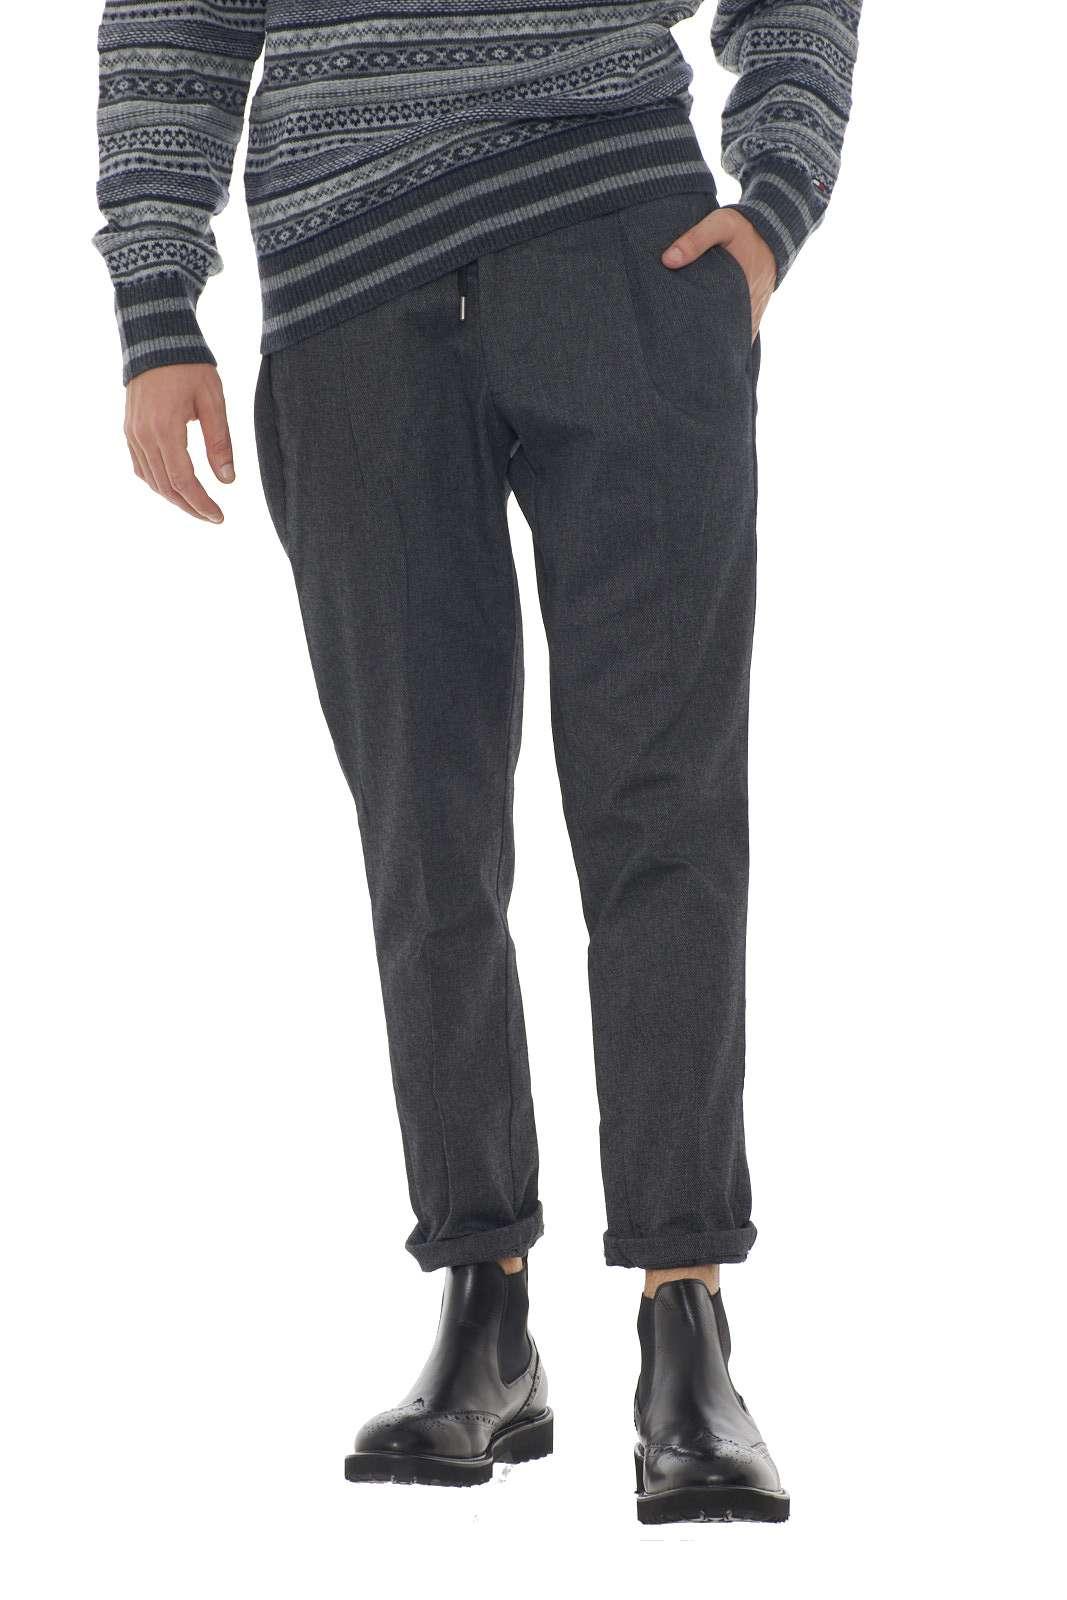 https://www.parmax.com/media/catalog/product/a/i/AI-outlet_parmax-pantaloni-uomo-Micheal%20Coal-johnny3289-B.jpg